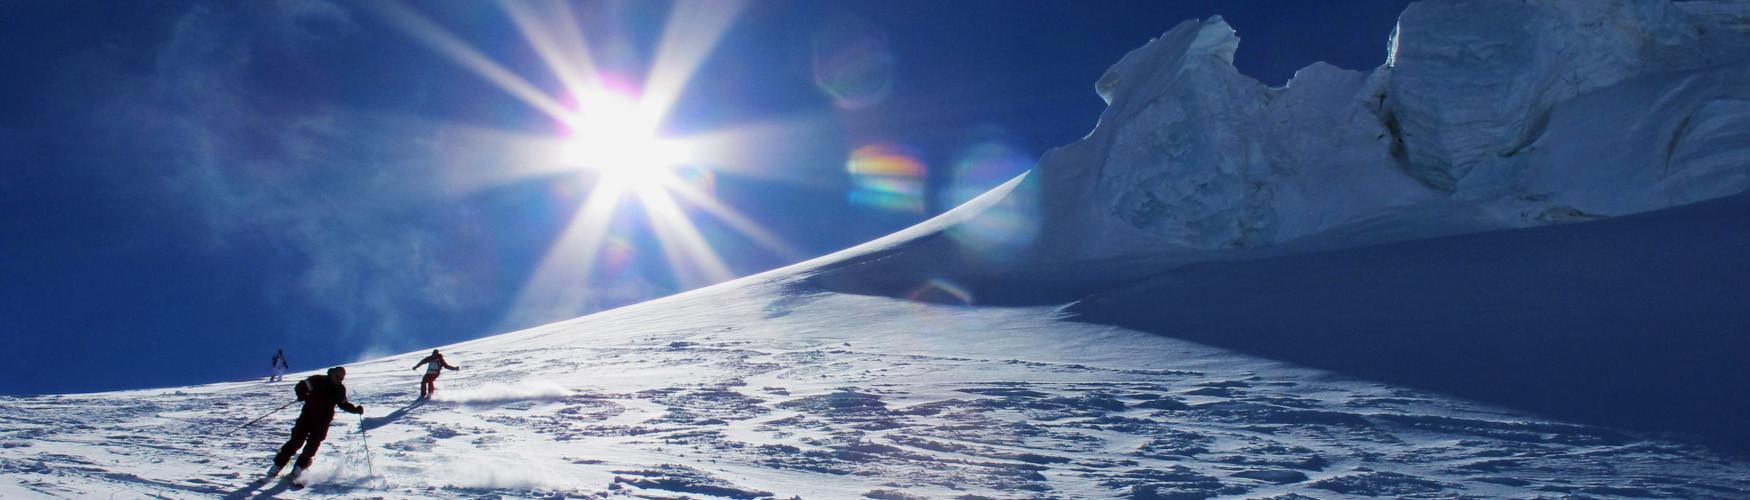 Heliski Schweiz Zermatt